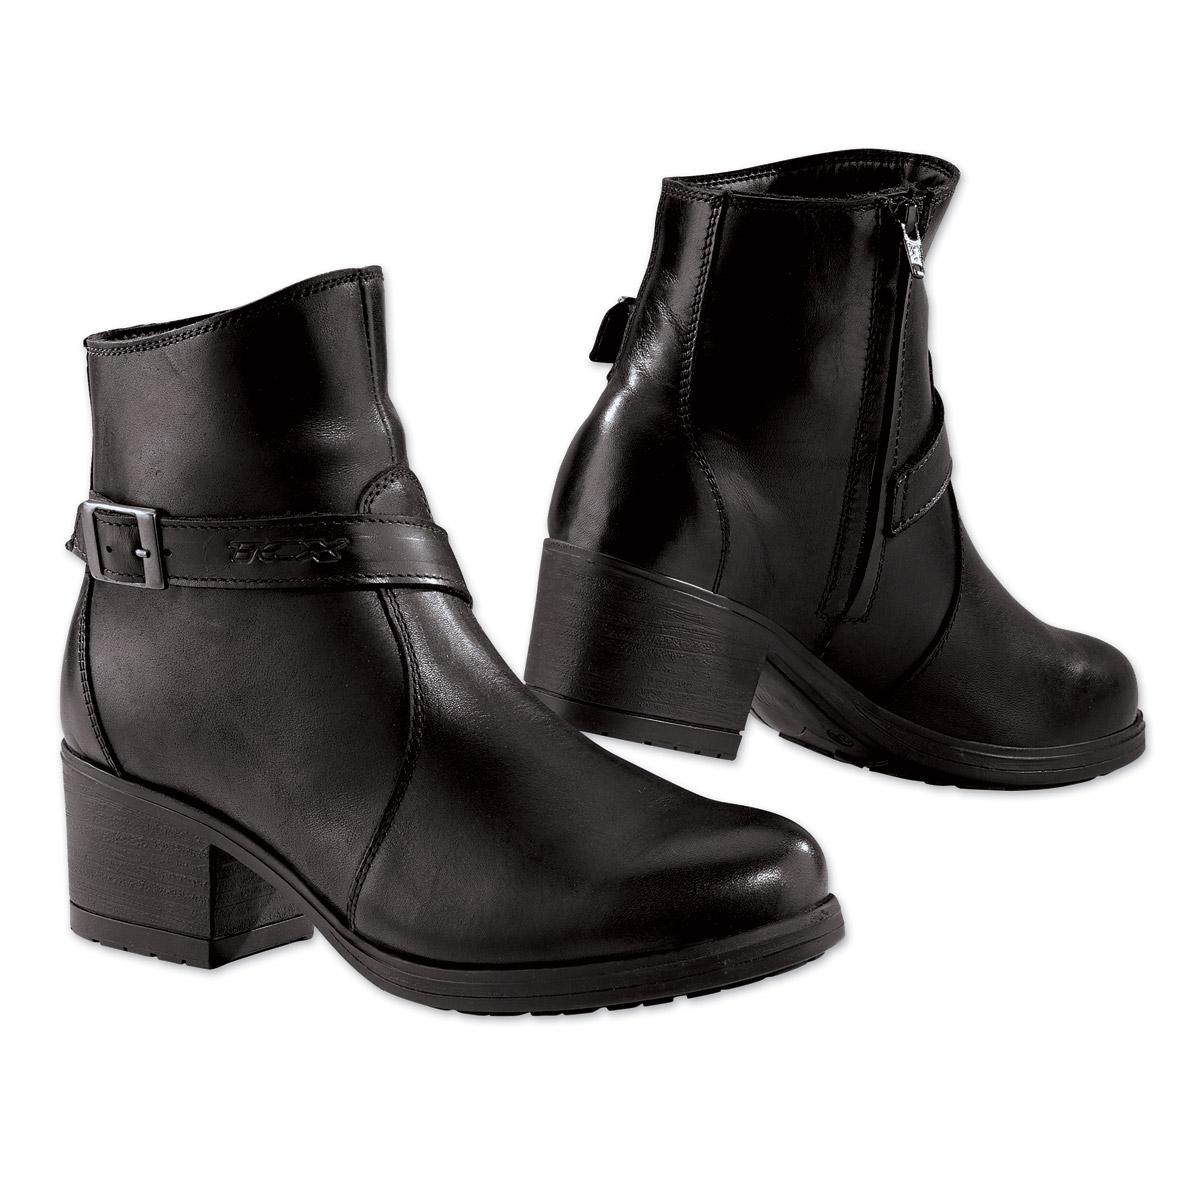 TCX-X-Boulevard-Waterproof-Women-039-s-Boots